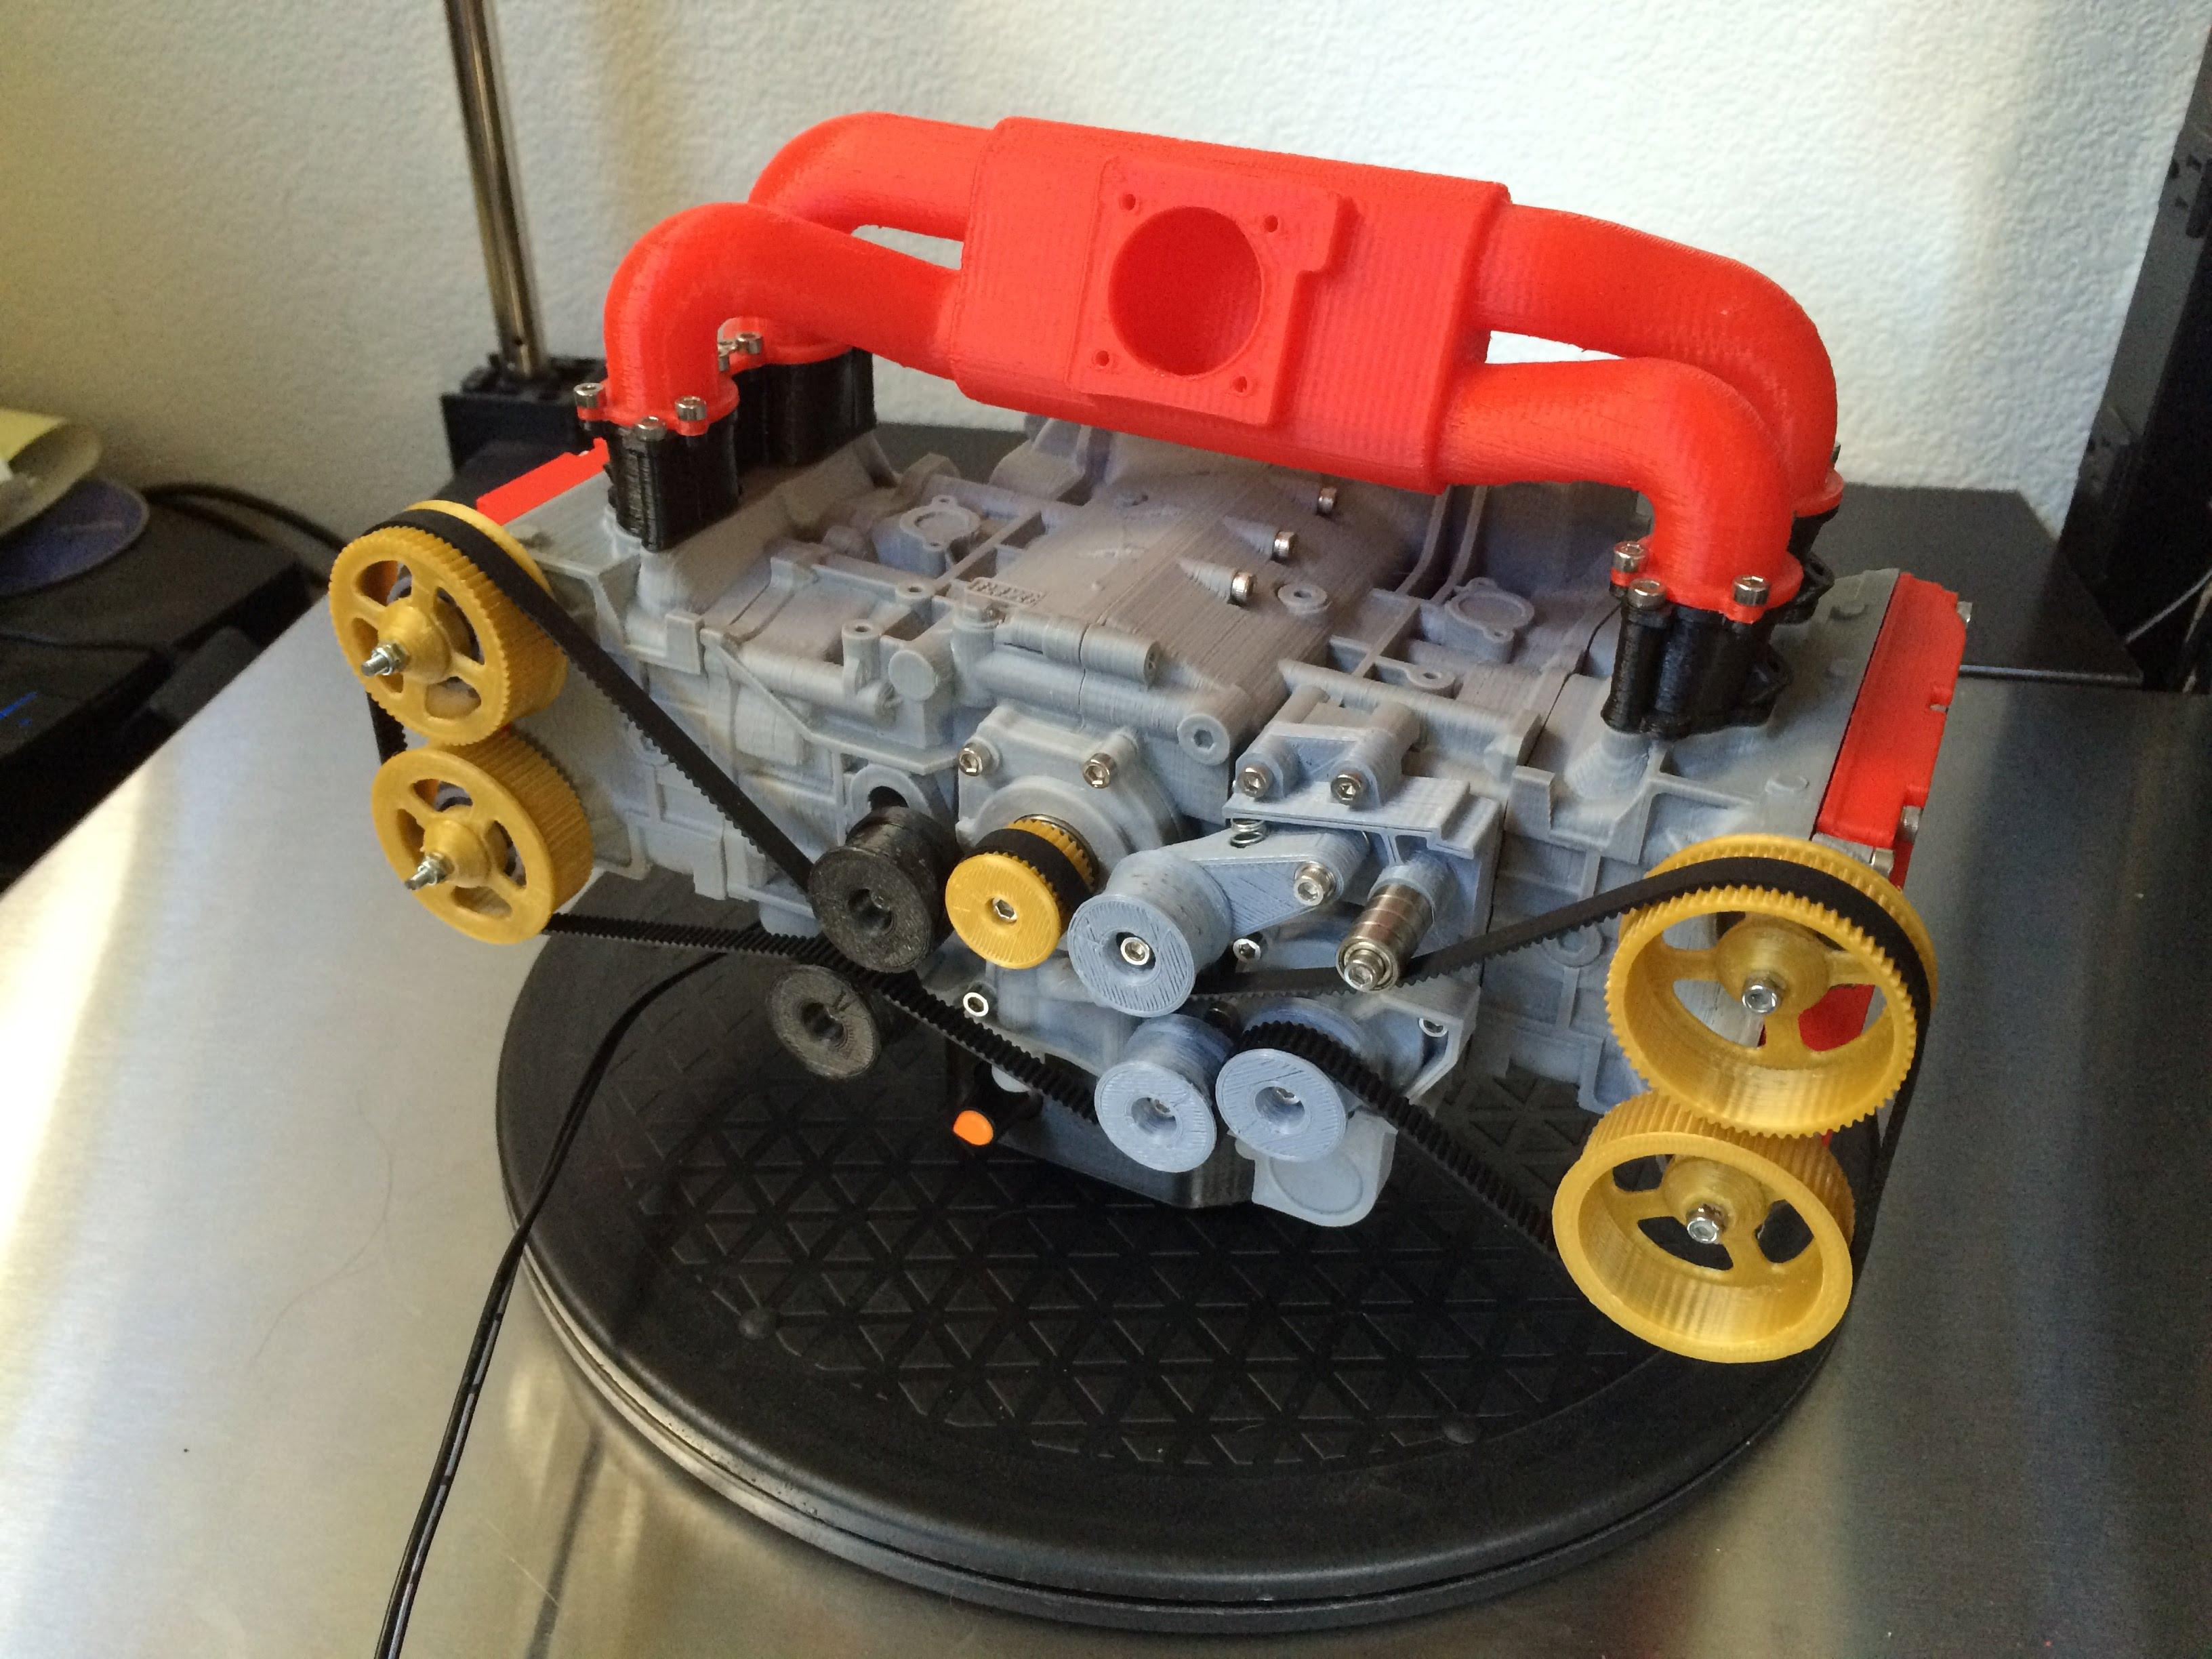 Guy Builds 3D Printed Subaru EJ20 Boxer Engine That Works ...